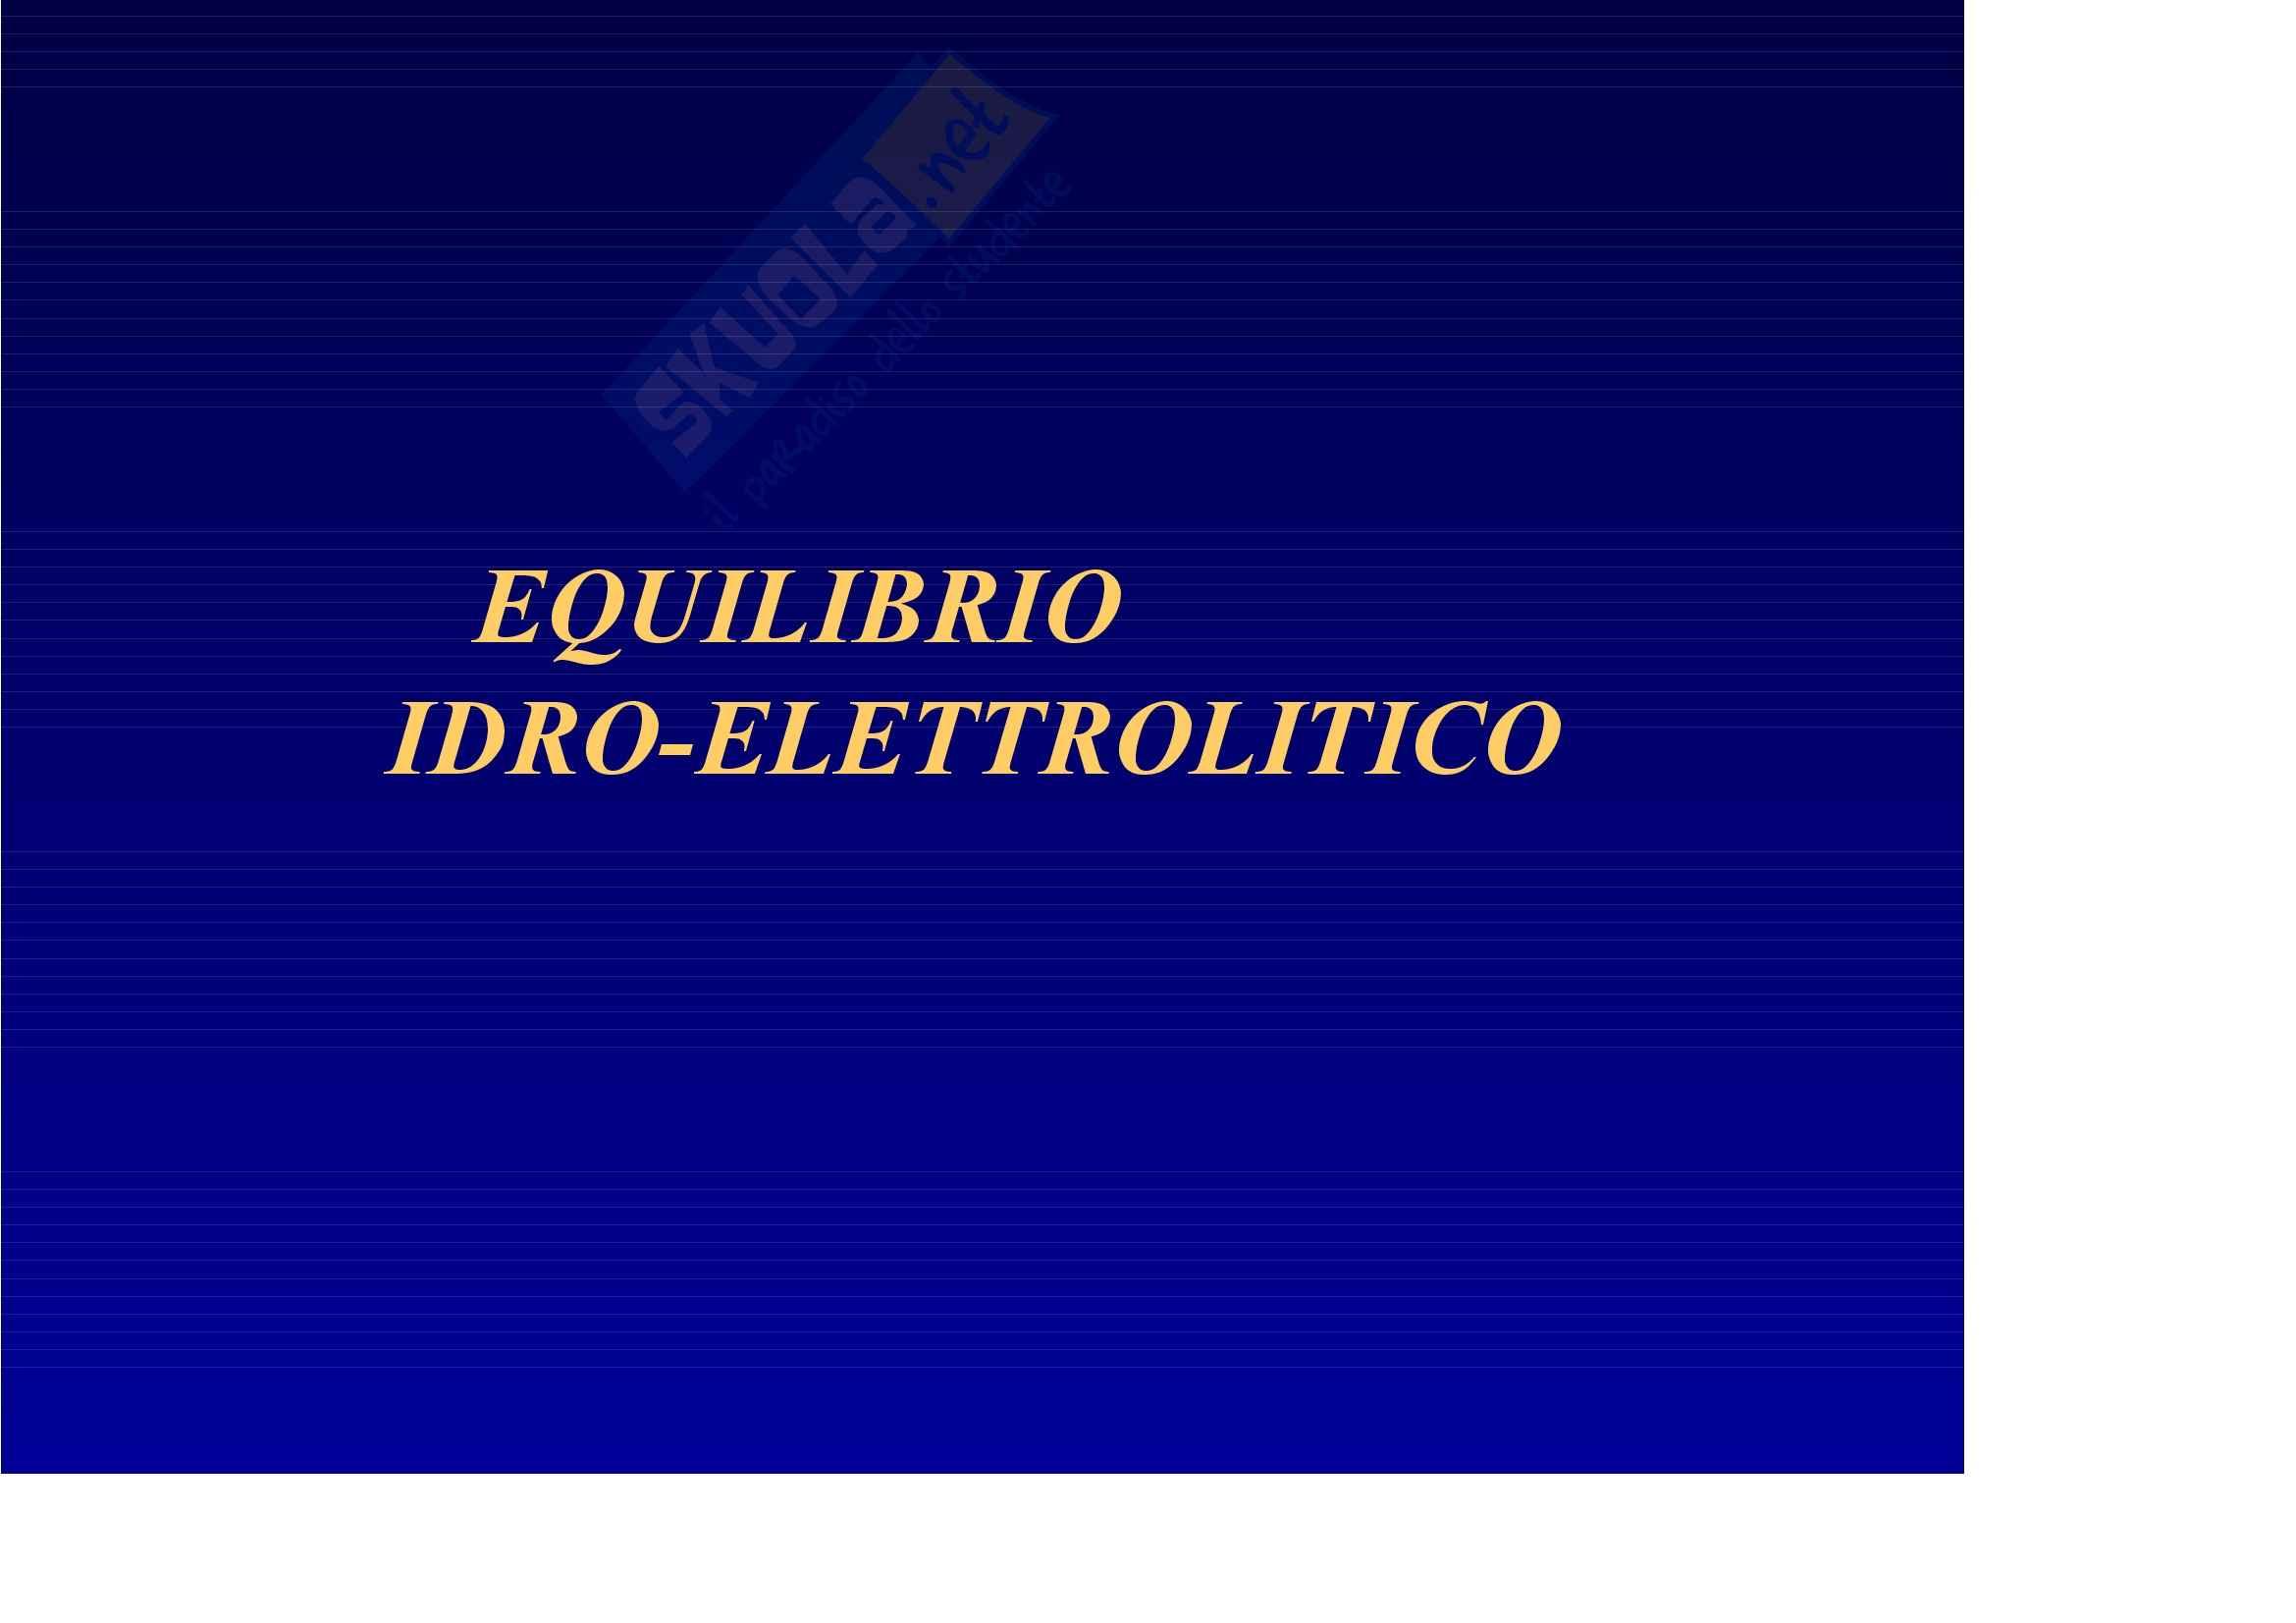 Nefrologia e urologia – Equilibrio idro elettrolitico